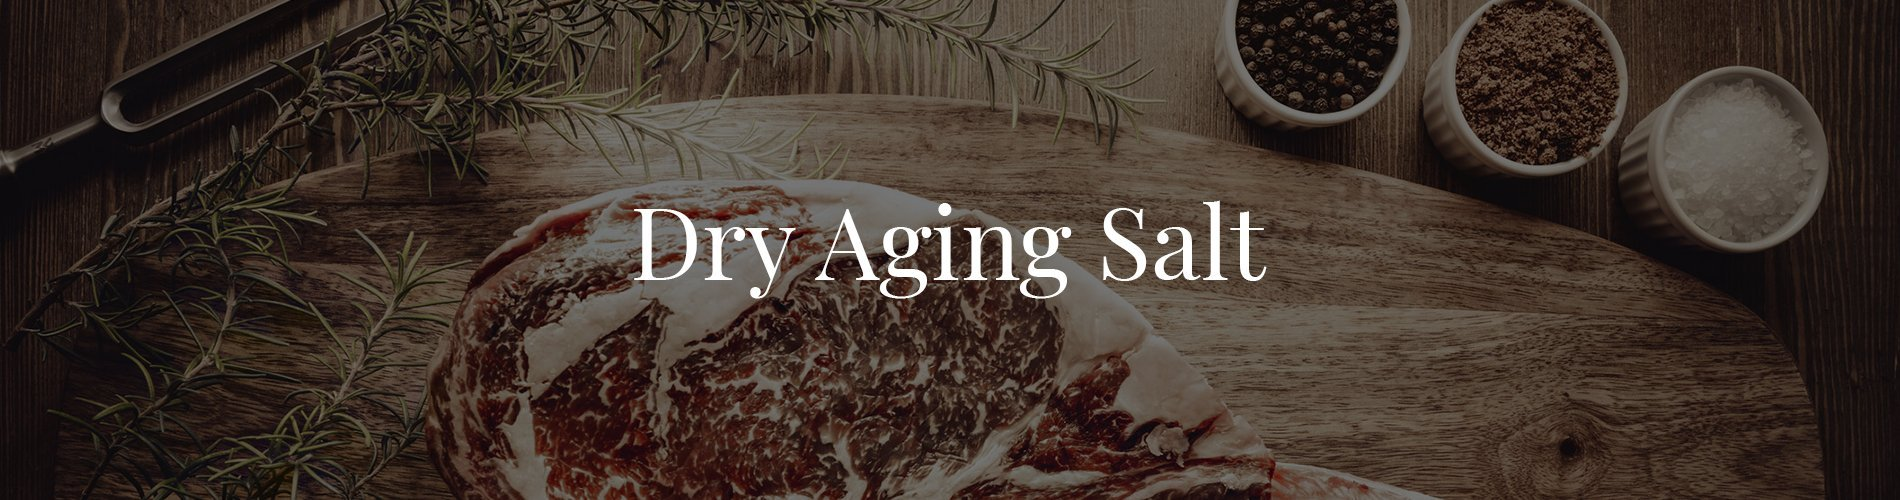 Dry Aging Salt Banner